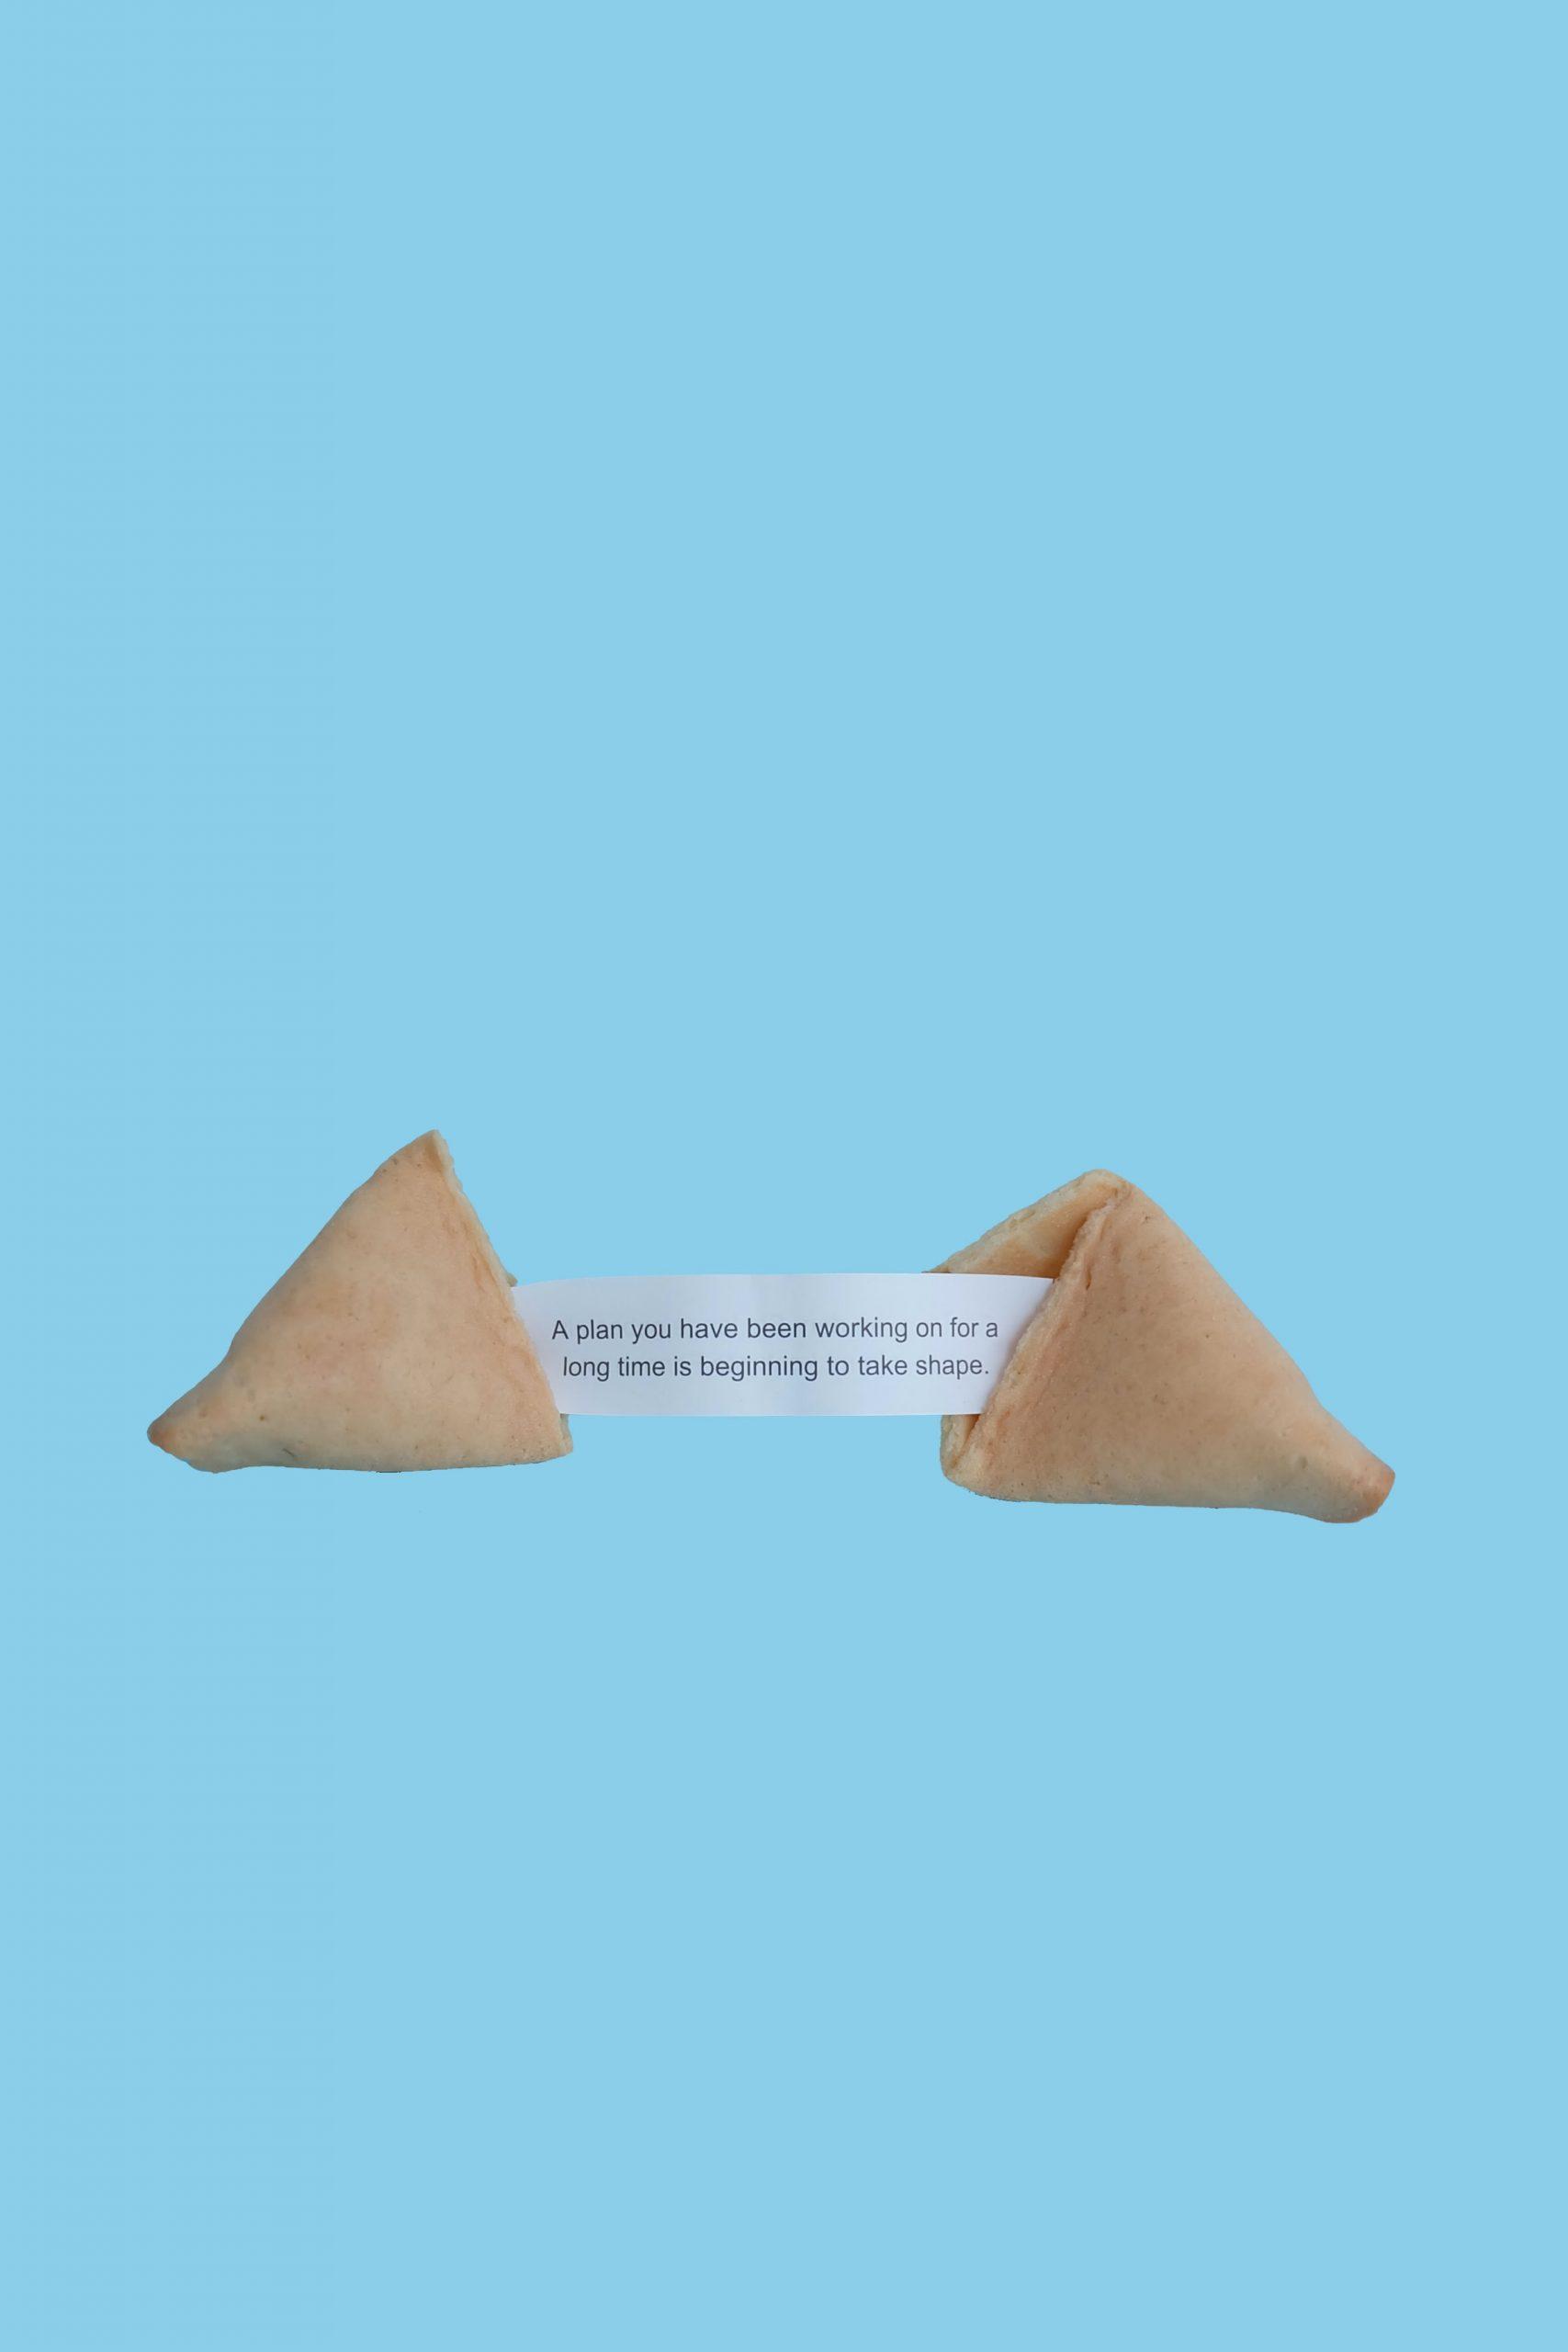 Fortune cookie - work in progress